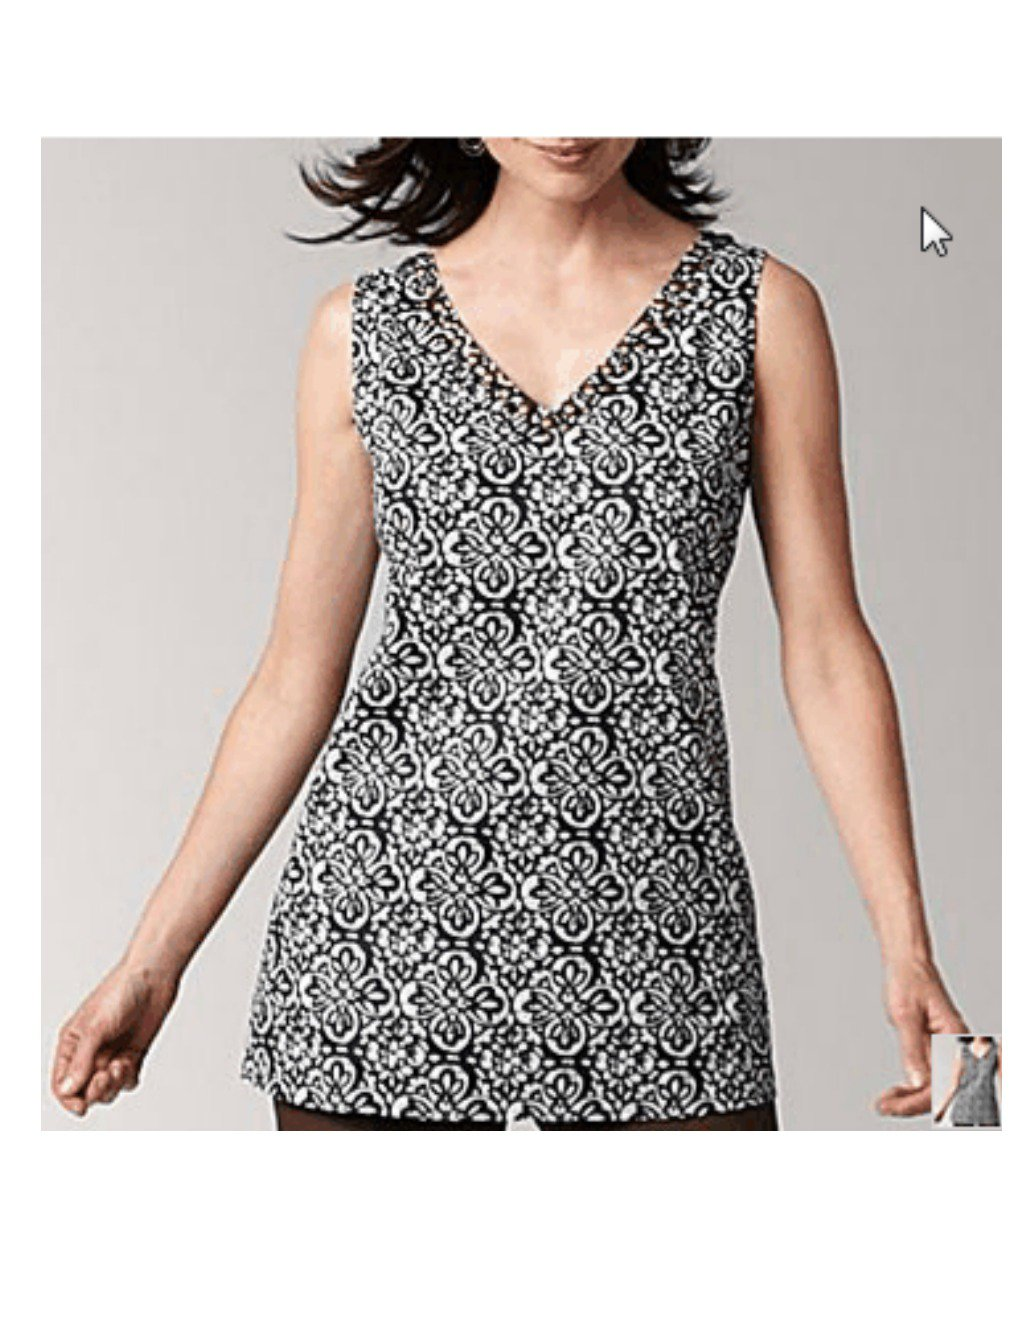 Liz Claiborne V-Neck Tunic Shirt Top Embellishment Size Medium M Navy Blue NEW